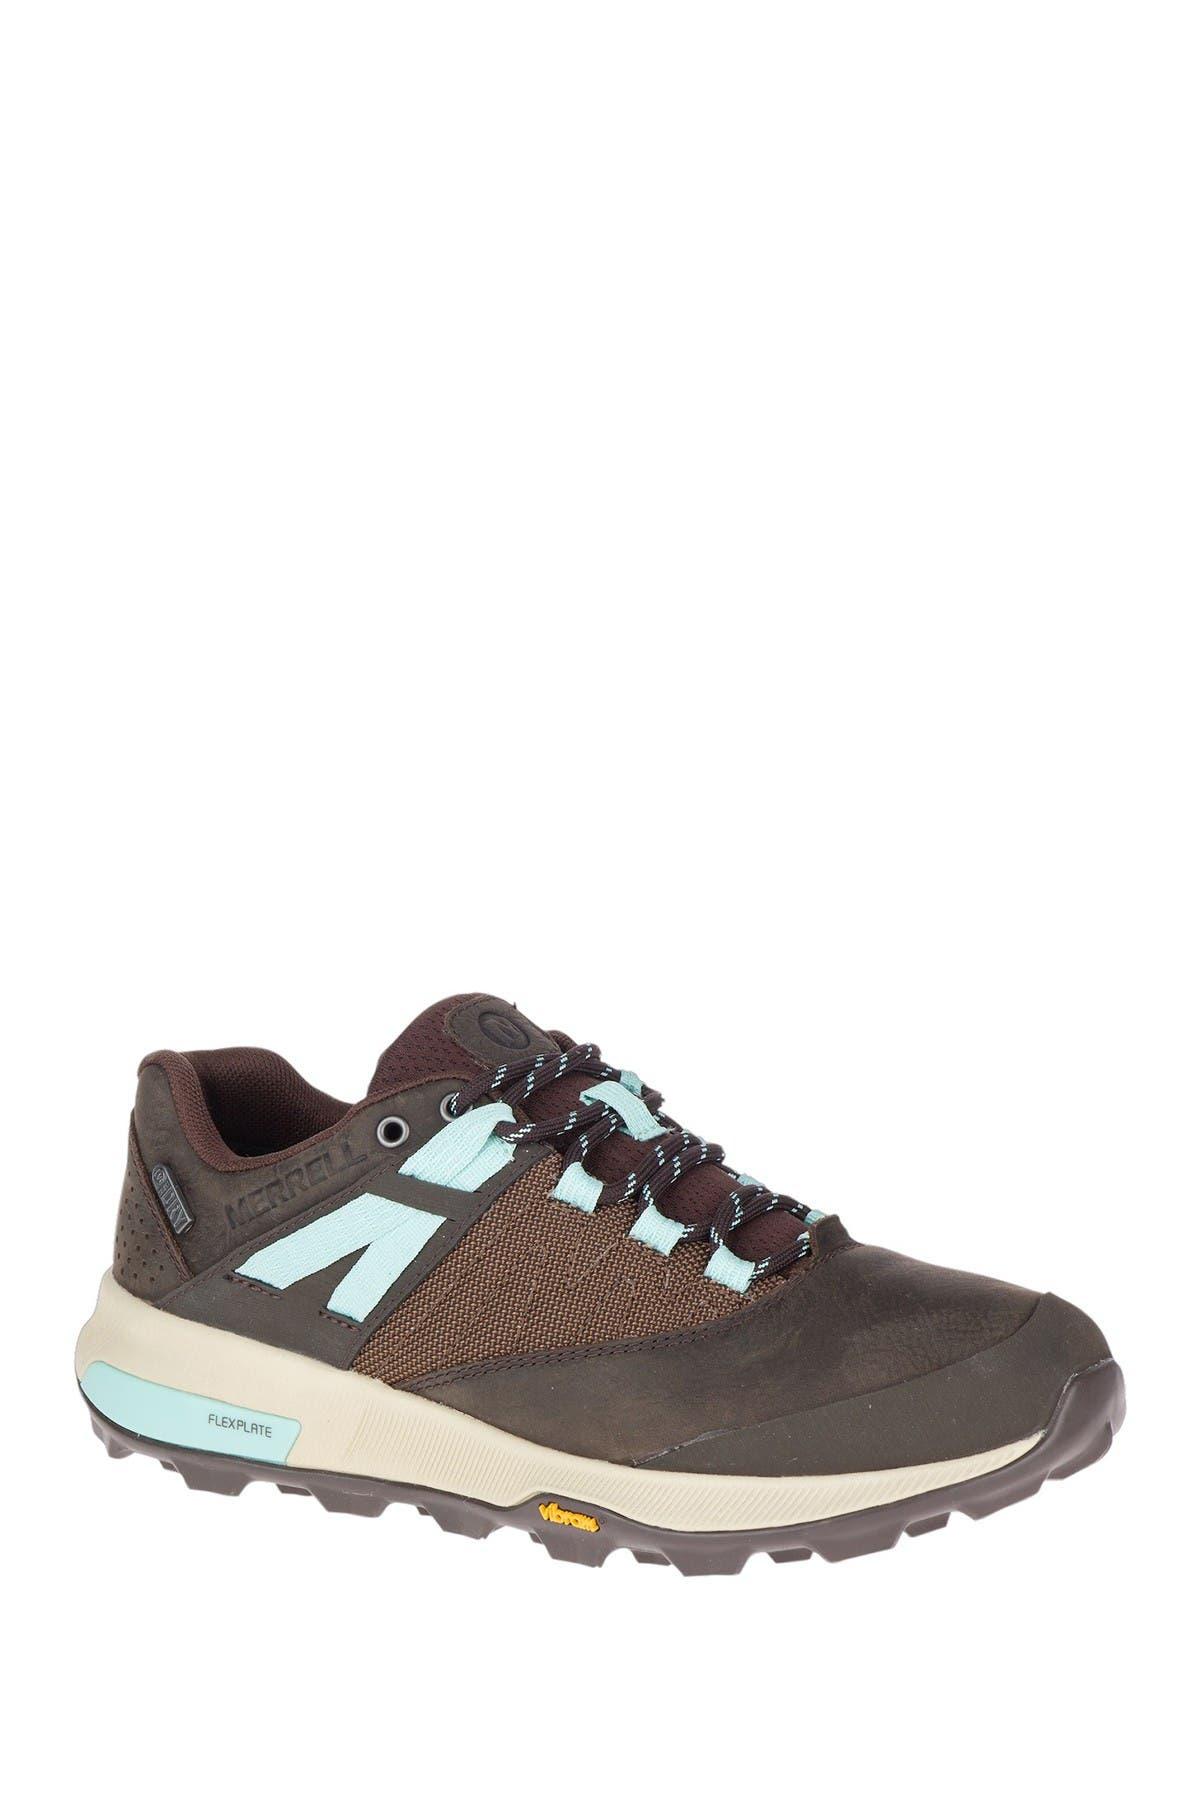 Image of Merrell Zion Waterproof Leather Sneaker